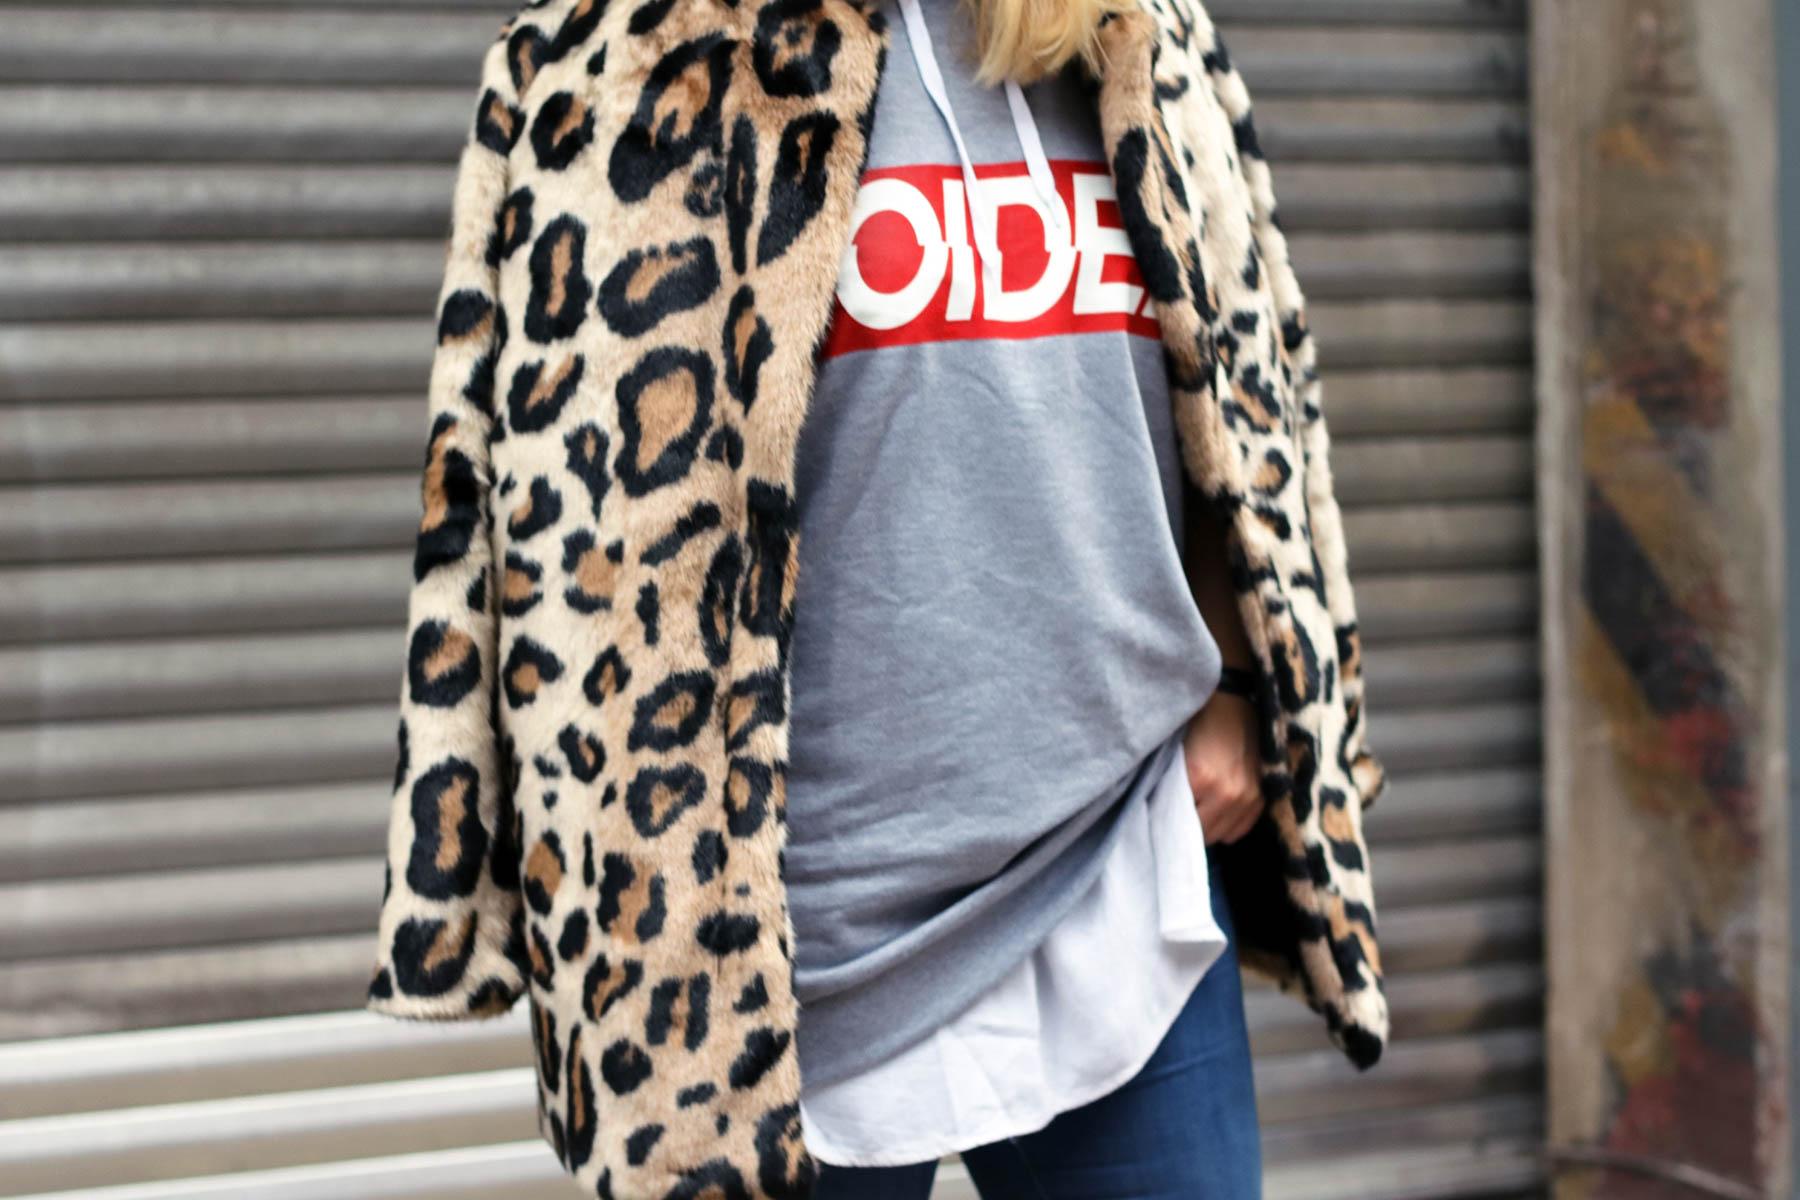 outfit-modeblog-fashionblog-fashionpassionlove-leo-mantel-trend-mantel-winter-sneaker-adidas28 (1 von 1)